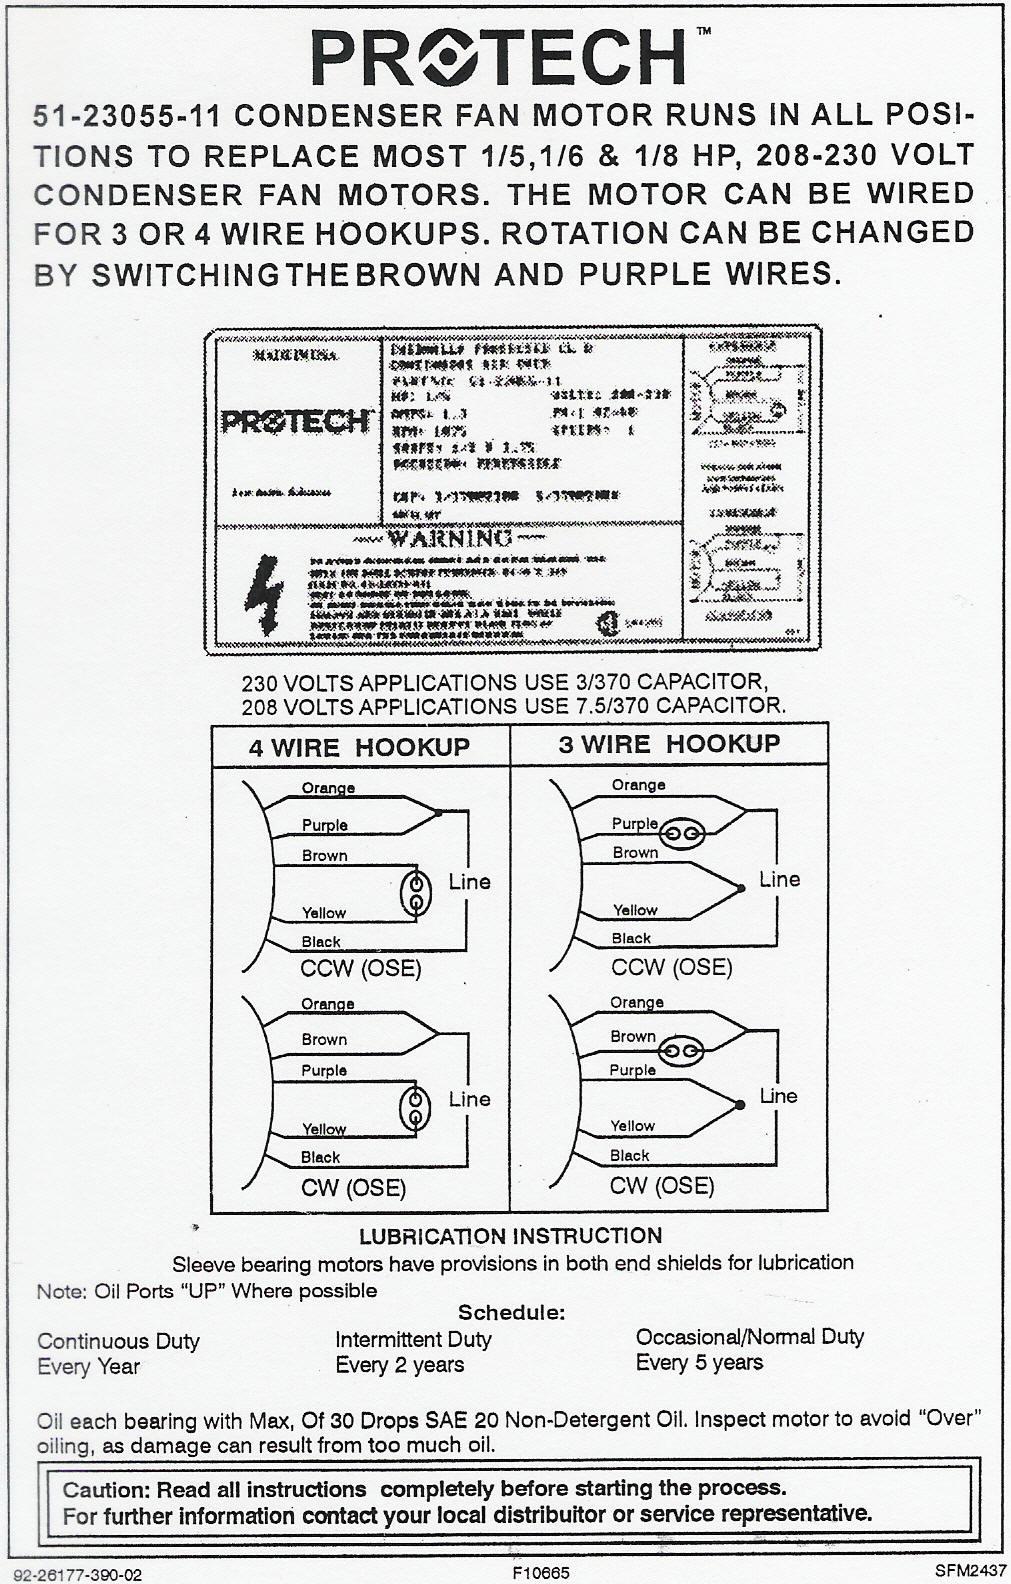 Rheem Ruud Condenser Fan Motor 51 23055 11 Wiring Diagram